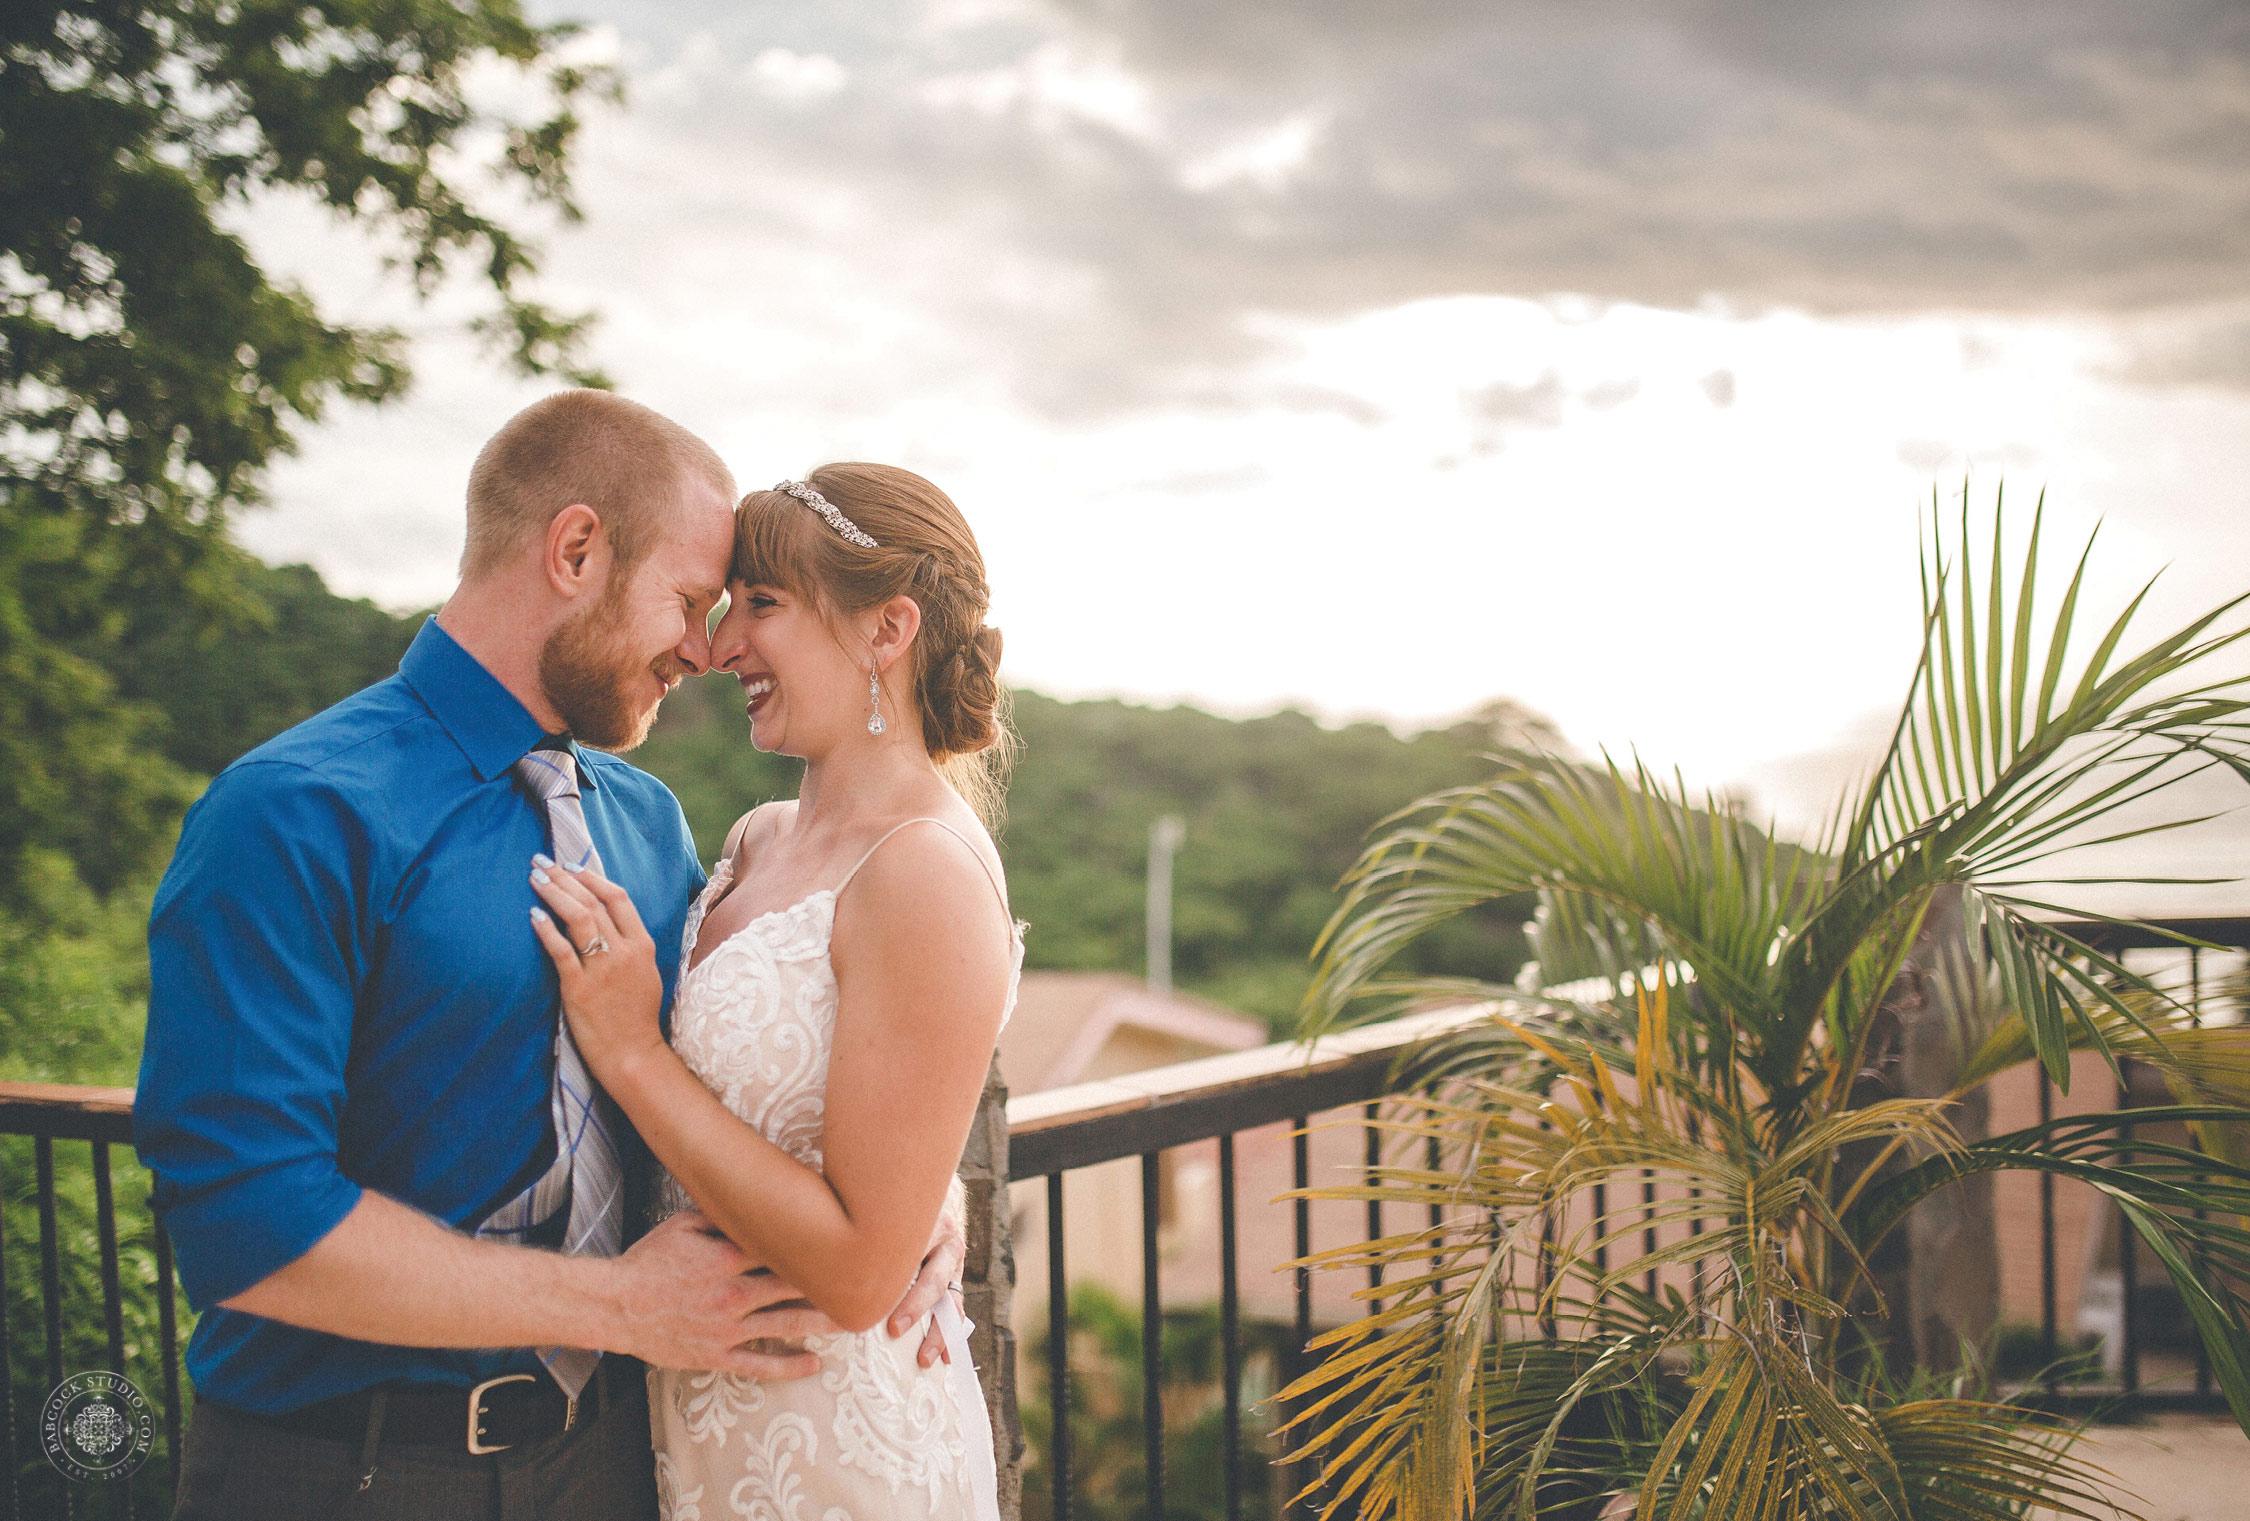 2cat-brandon-costa-rica-destination-wedding-photographer-dayton-ohio-25.jpg